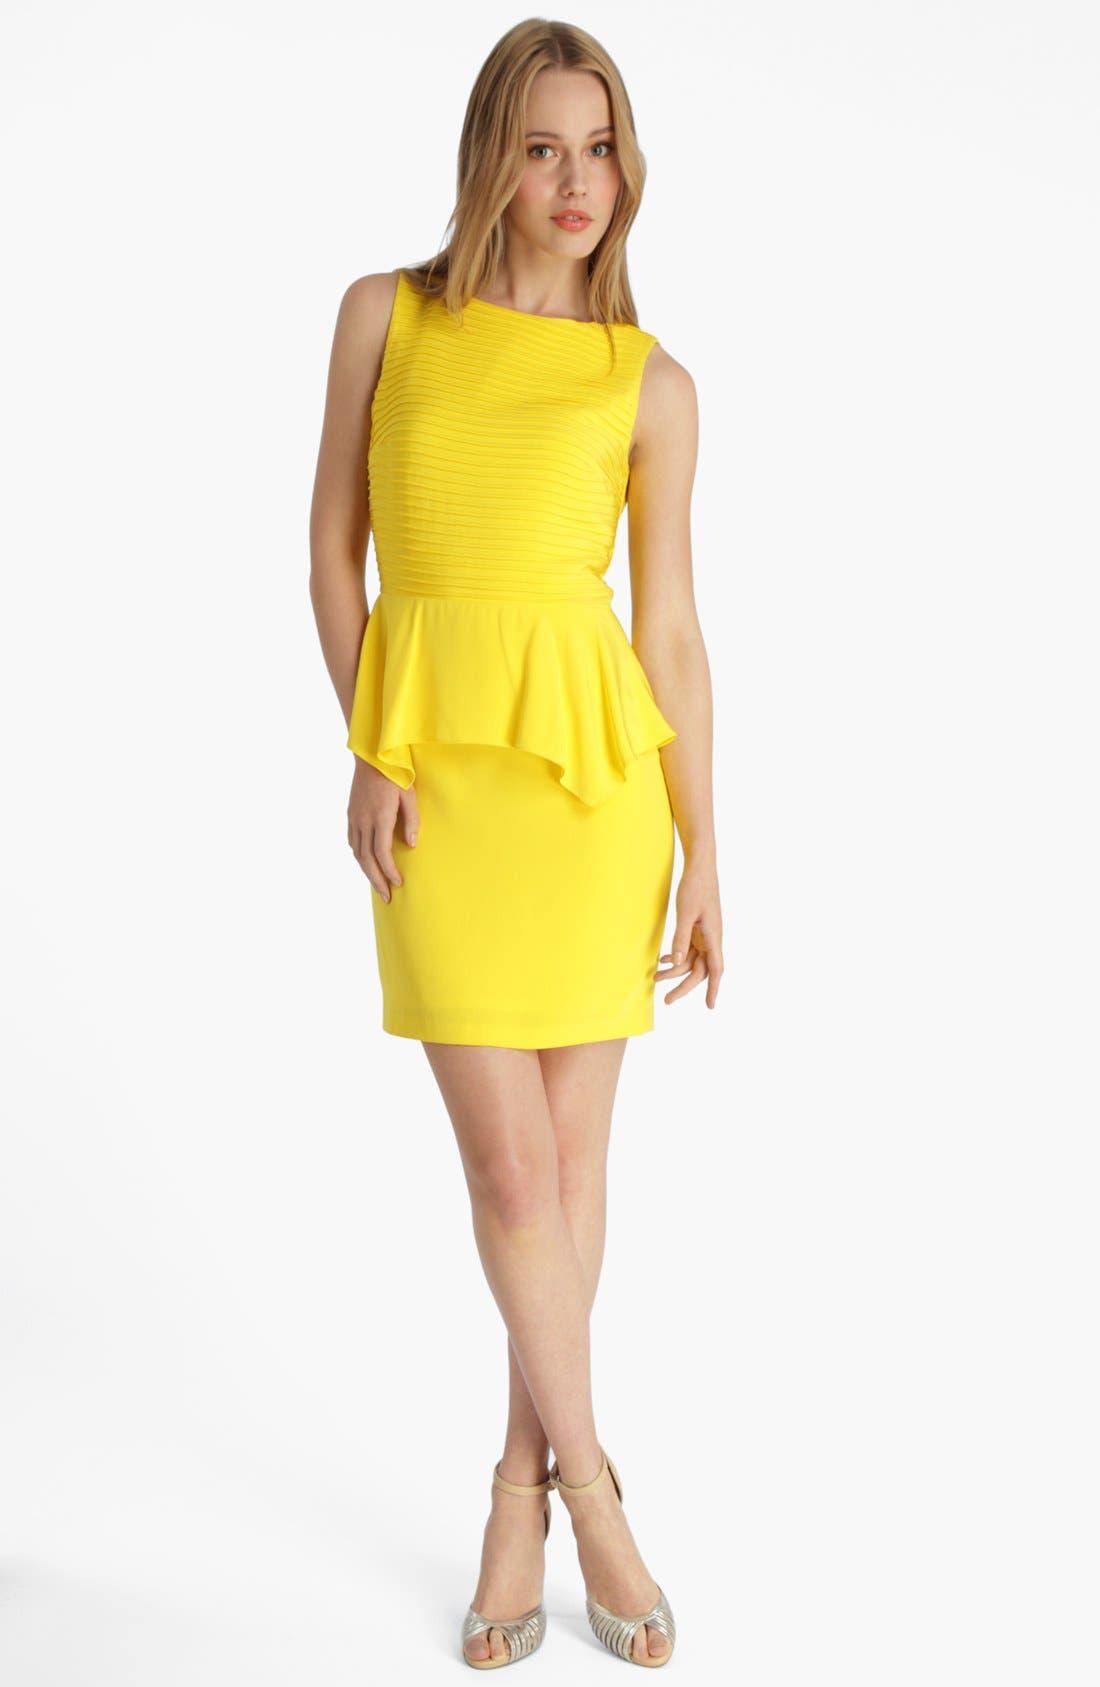 Alternate Image 1 Selected - Catherine Catherine Malandrino 'Penny' Peplum Dress